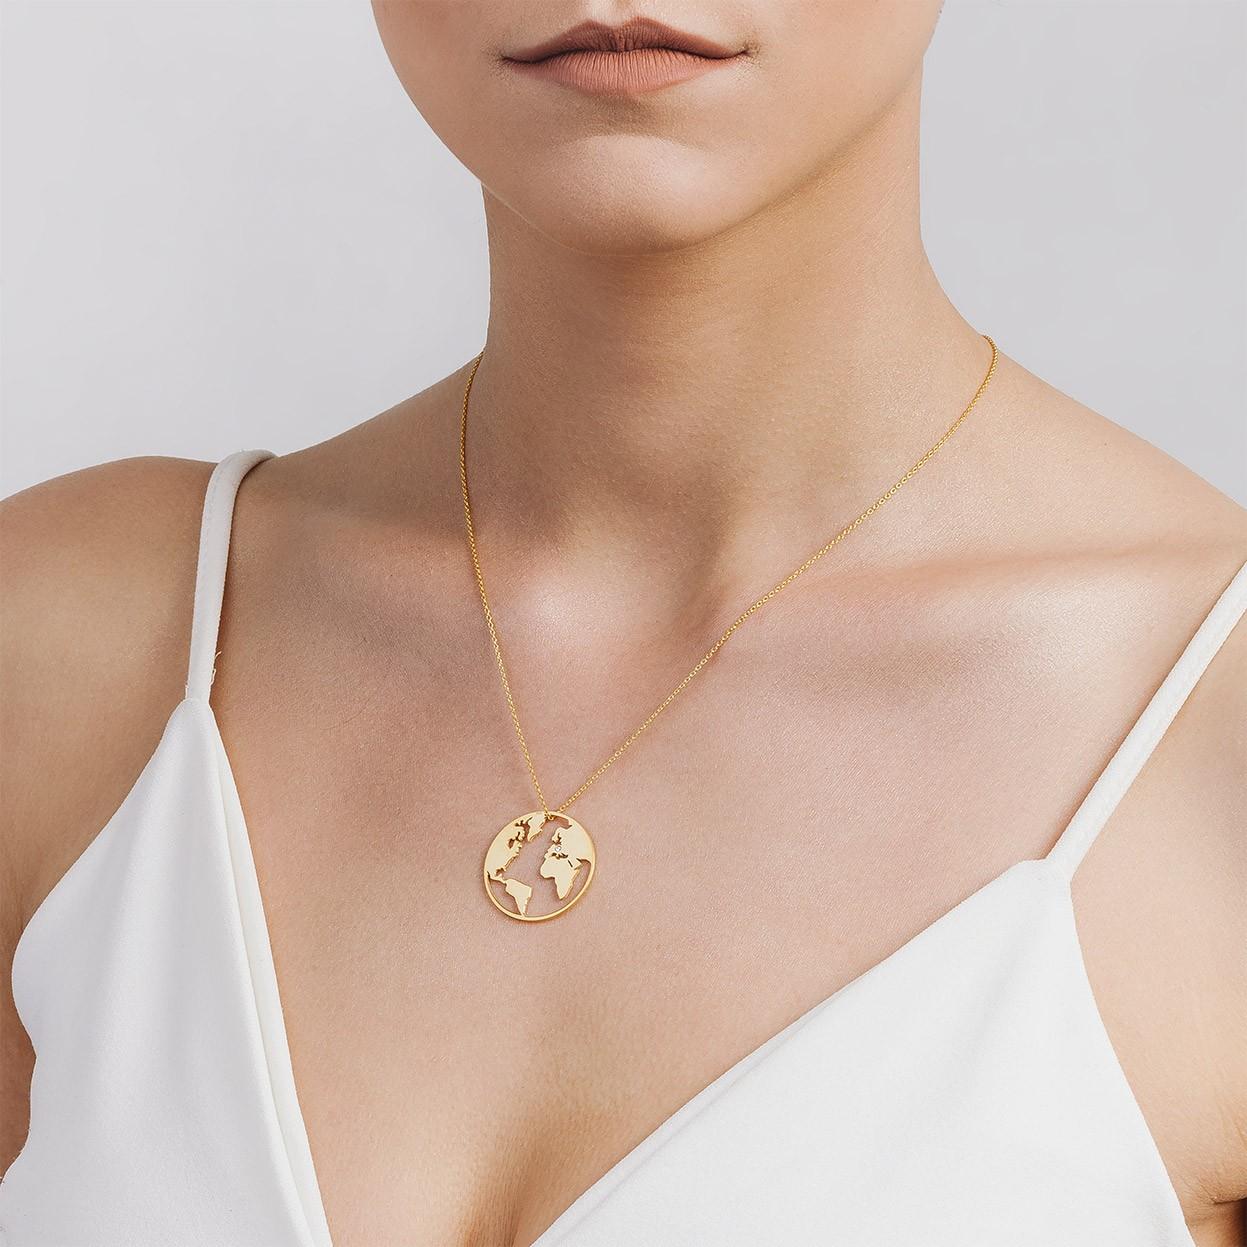 Corazón swarovski collar grabado plata